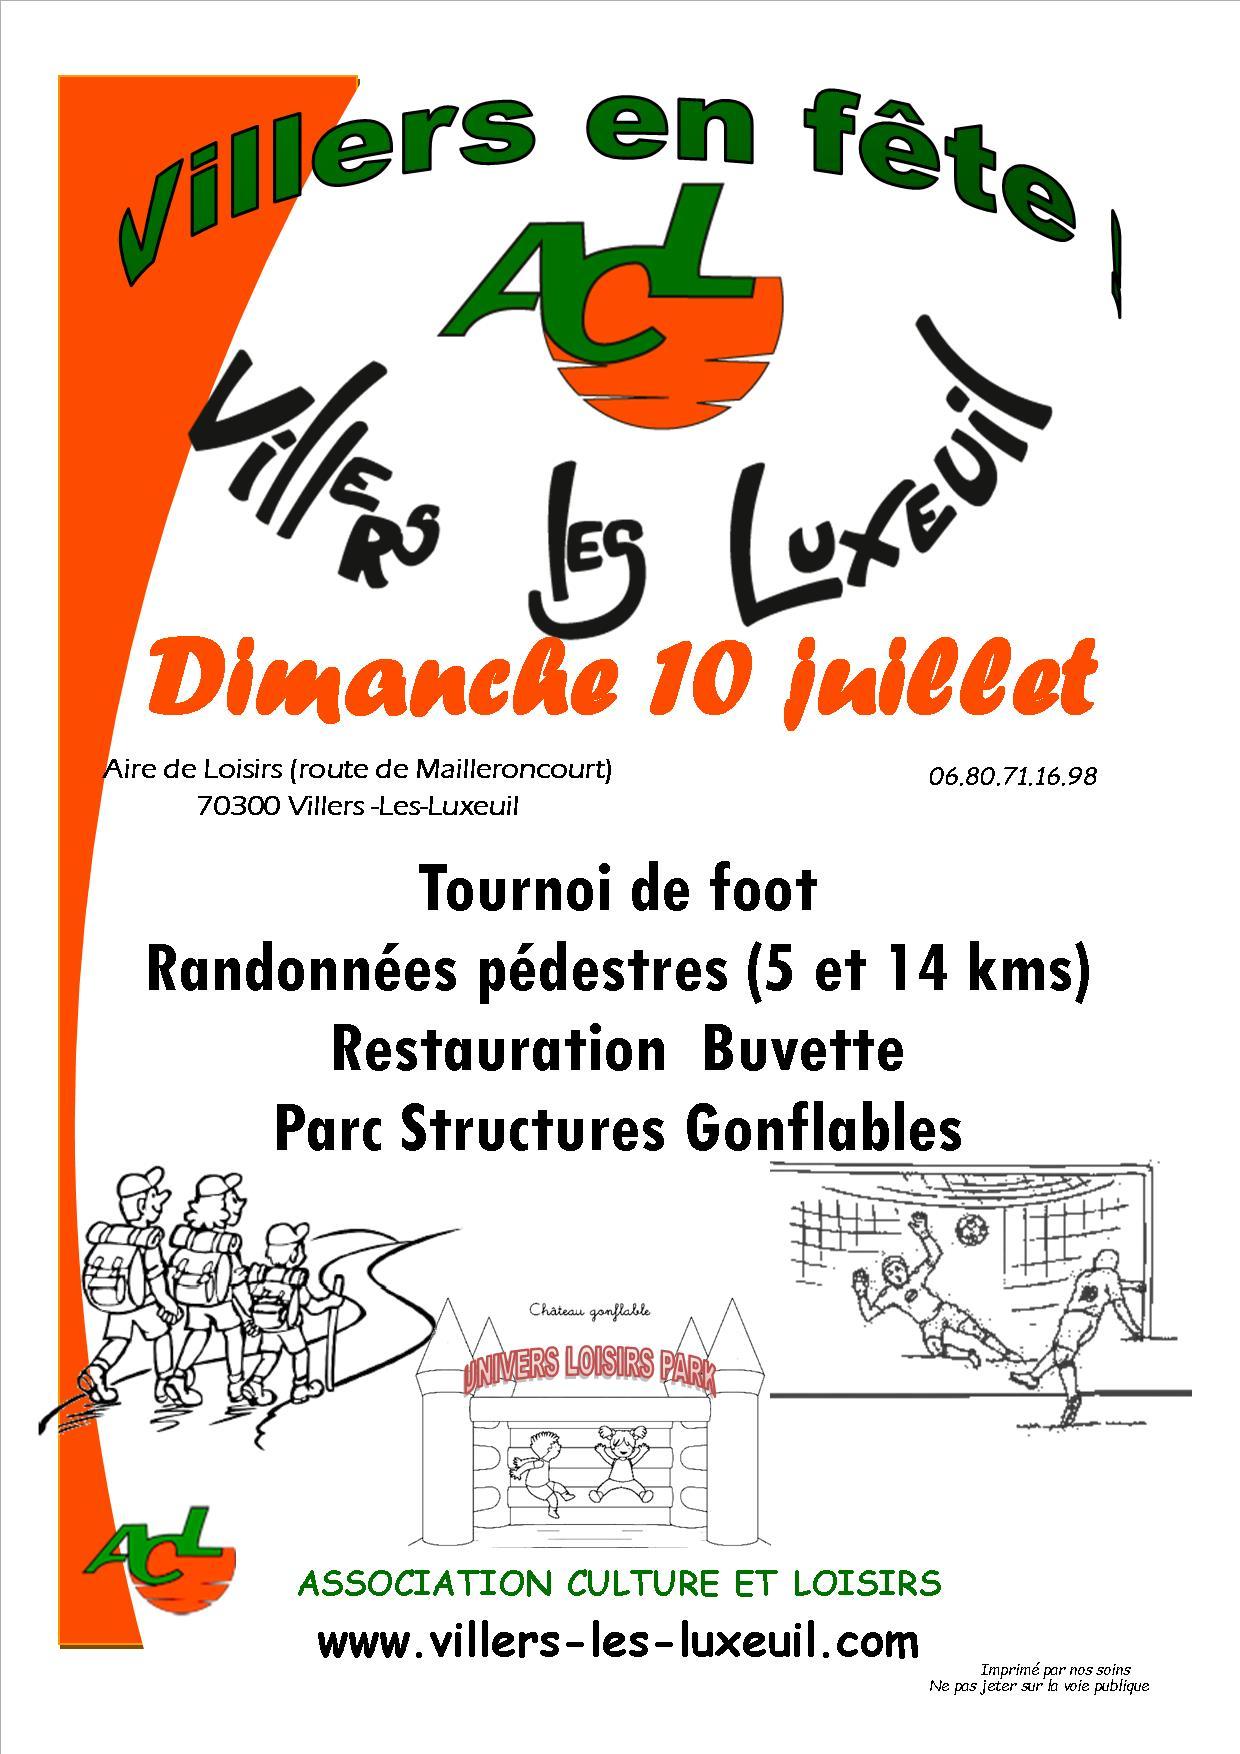 https://www.villers-les-luxeuil.com/projets/villers/files/images/2016_Evenements/Villers_En_Fete/VFV6.jpg